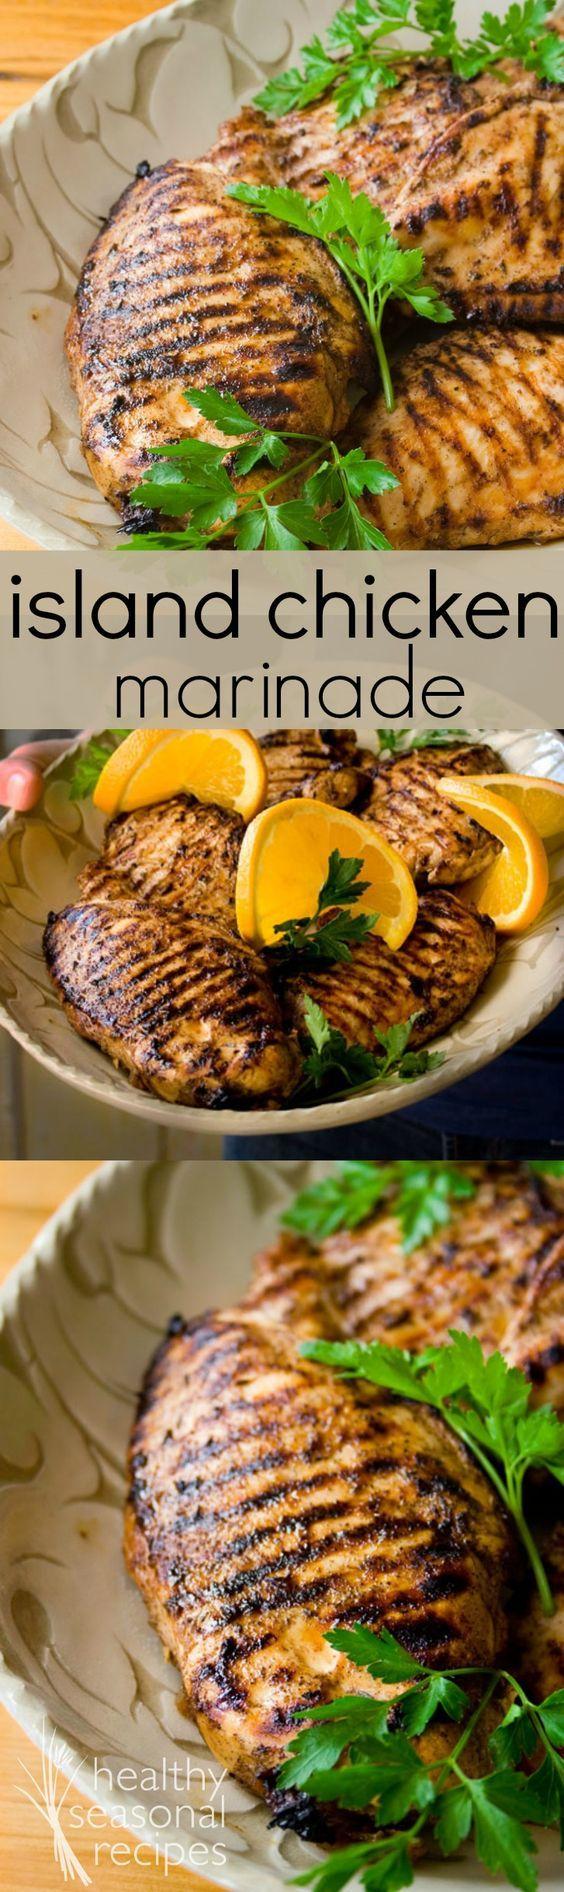 isabel's island chicken marinade - Healthy Seasonal Recipes